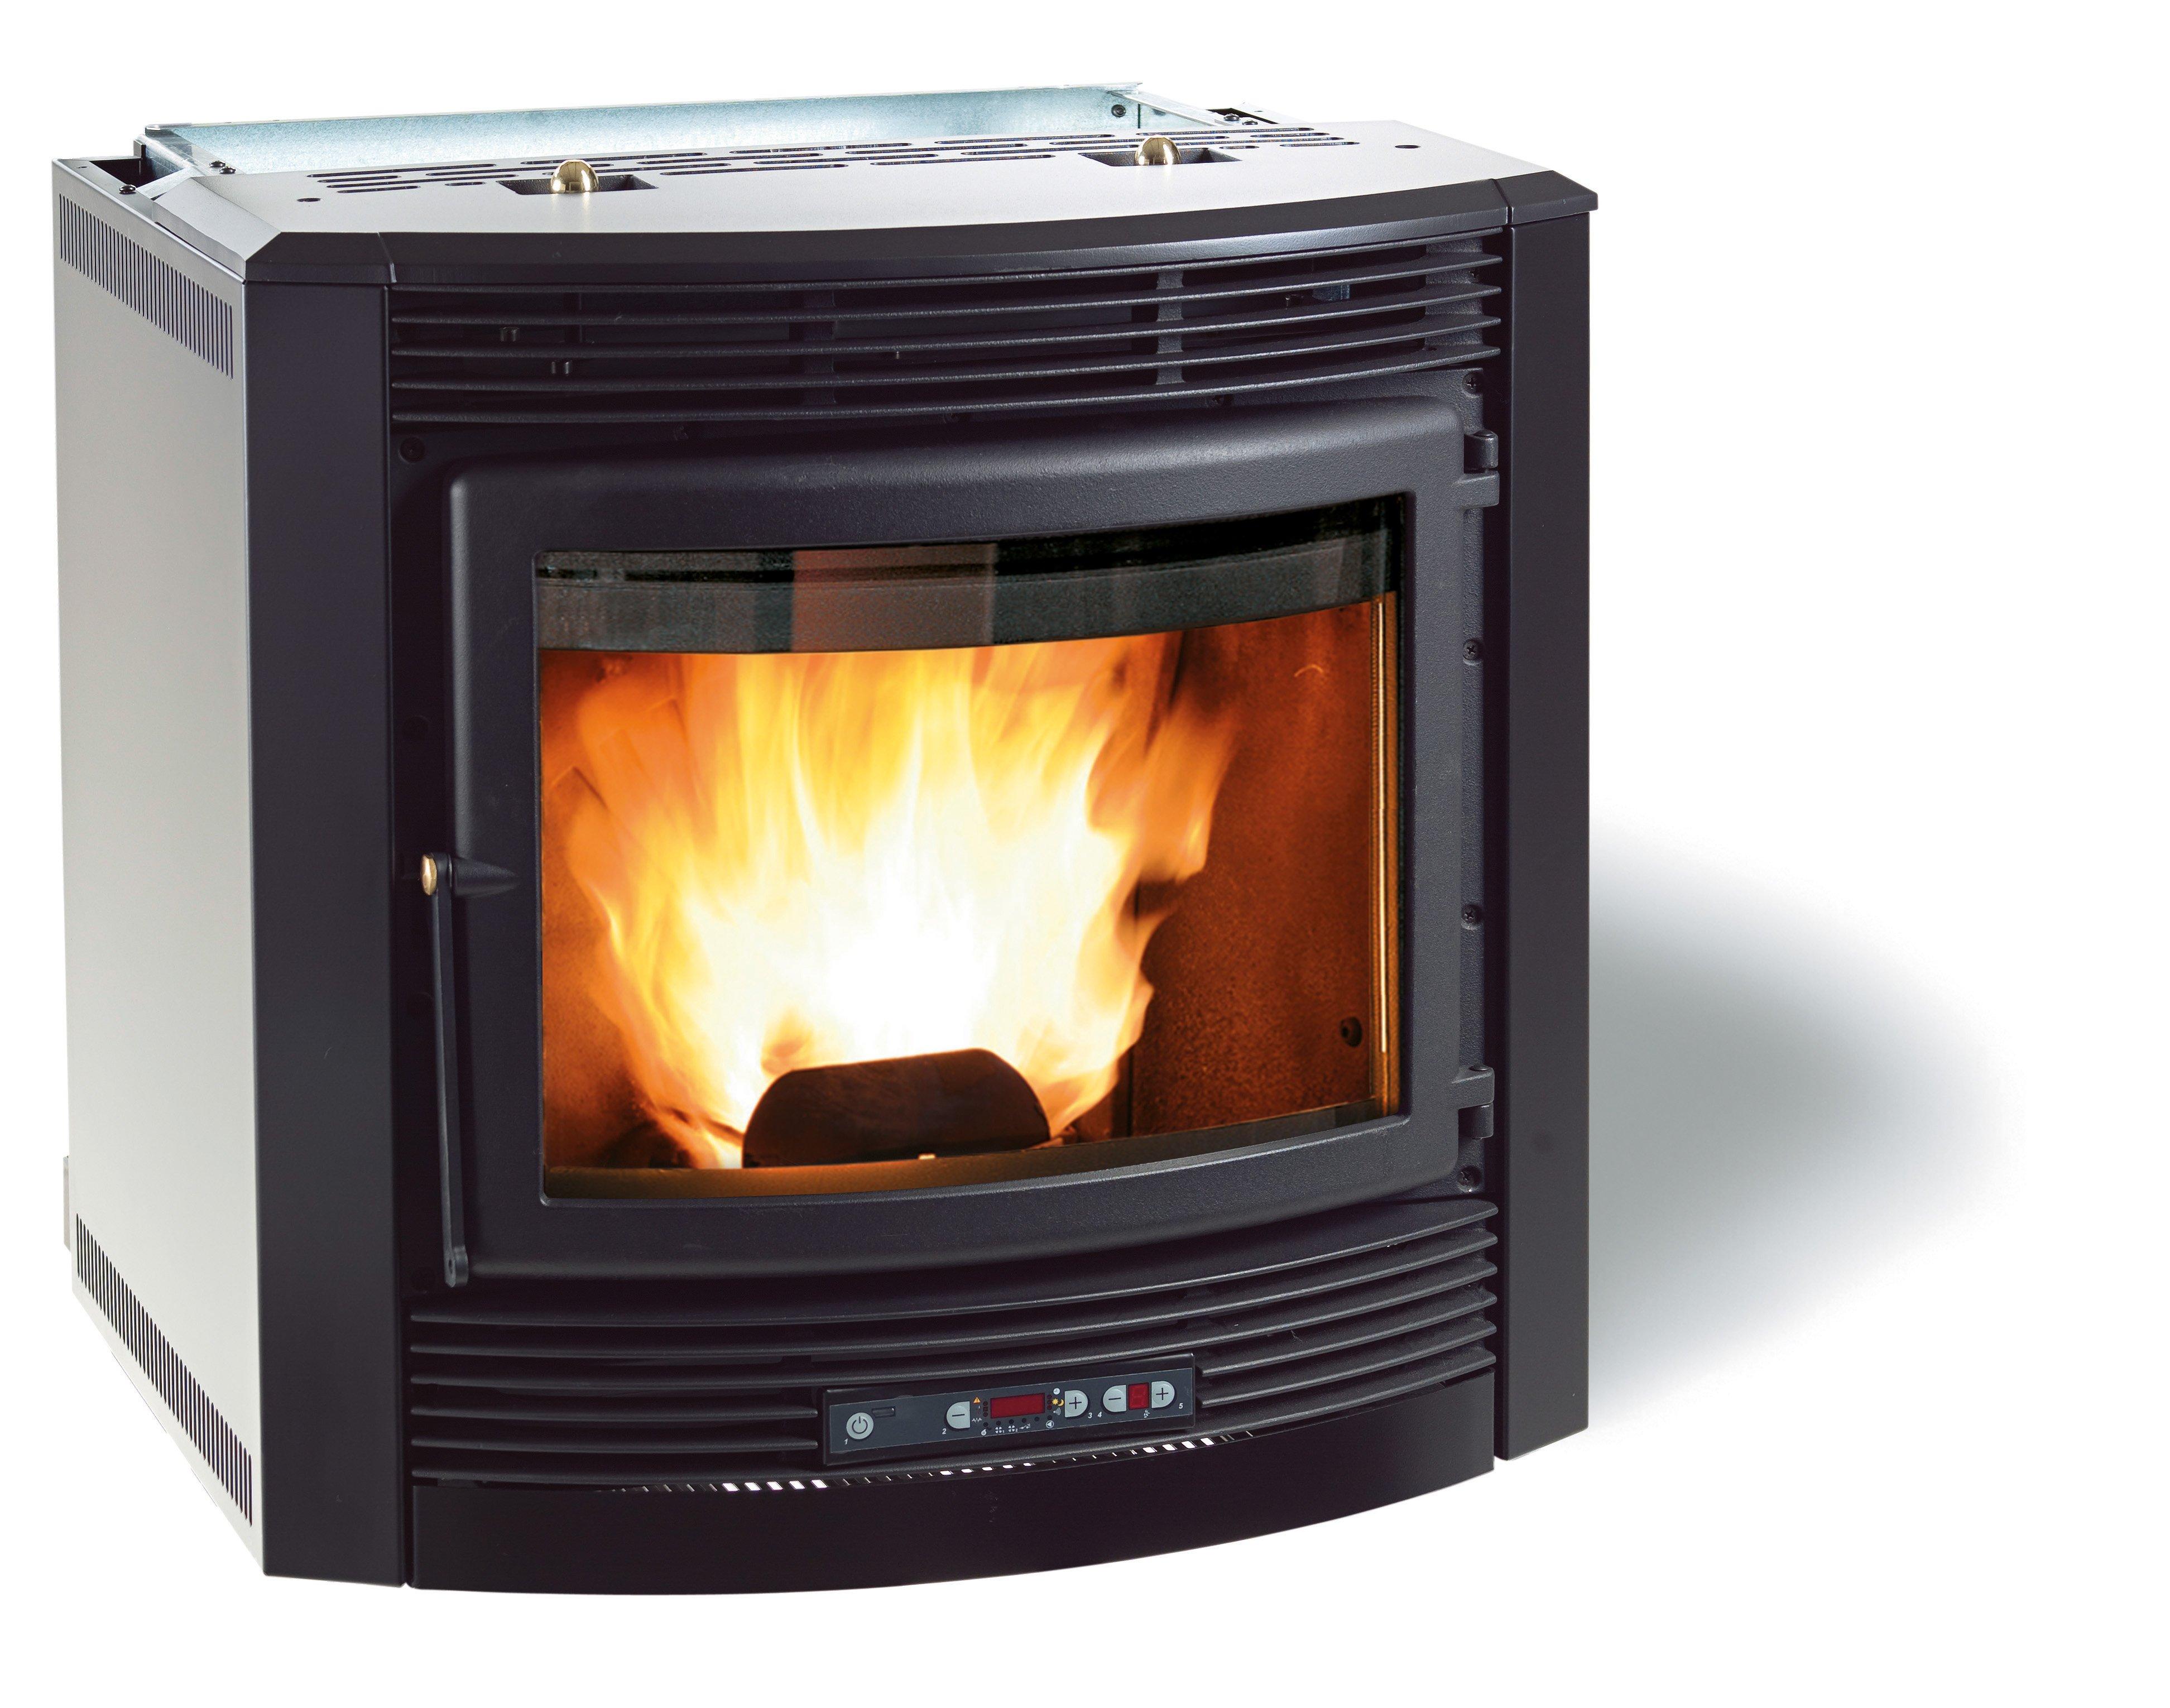 Vendita ricambi originali per stufe, termostufe, caldaie, camini